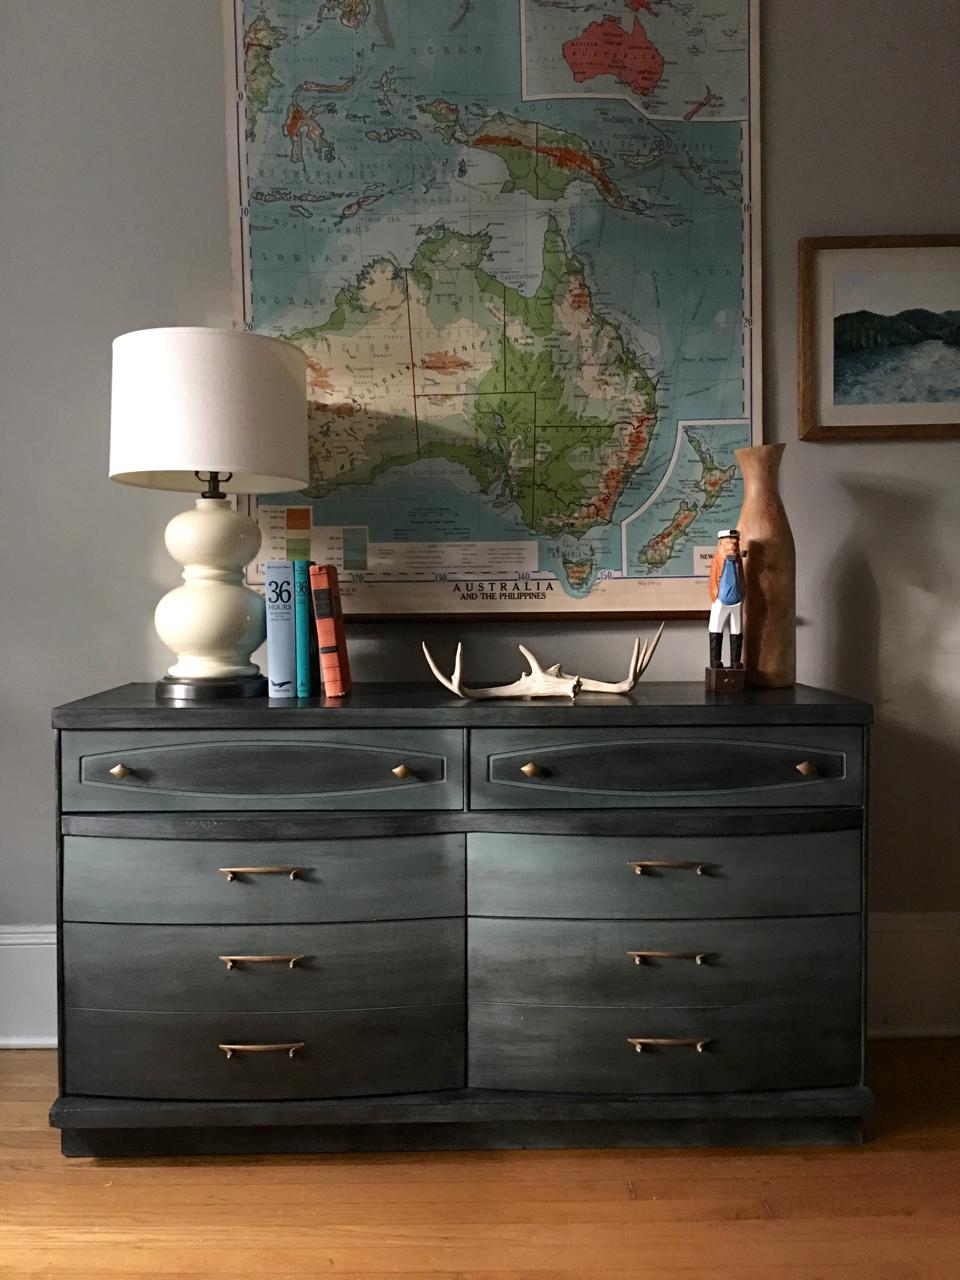 jo-torrijos-a-simpler-design-atlanta-painted-furniture-graphite-ombre-mid-century-dresser-6.jpg